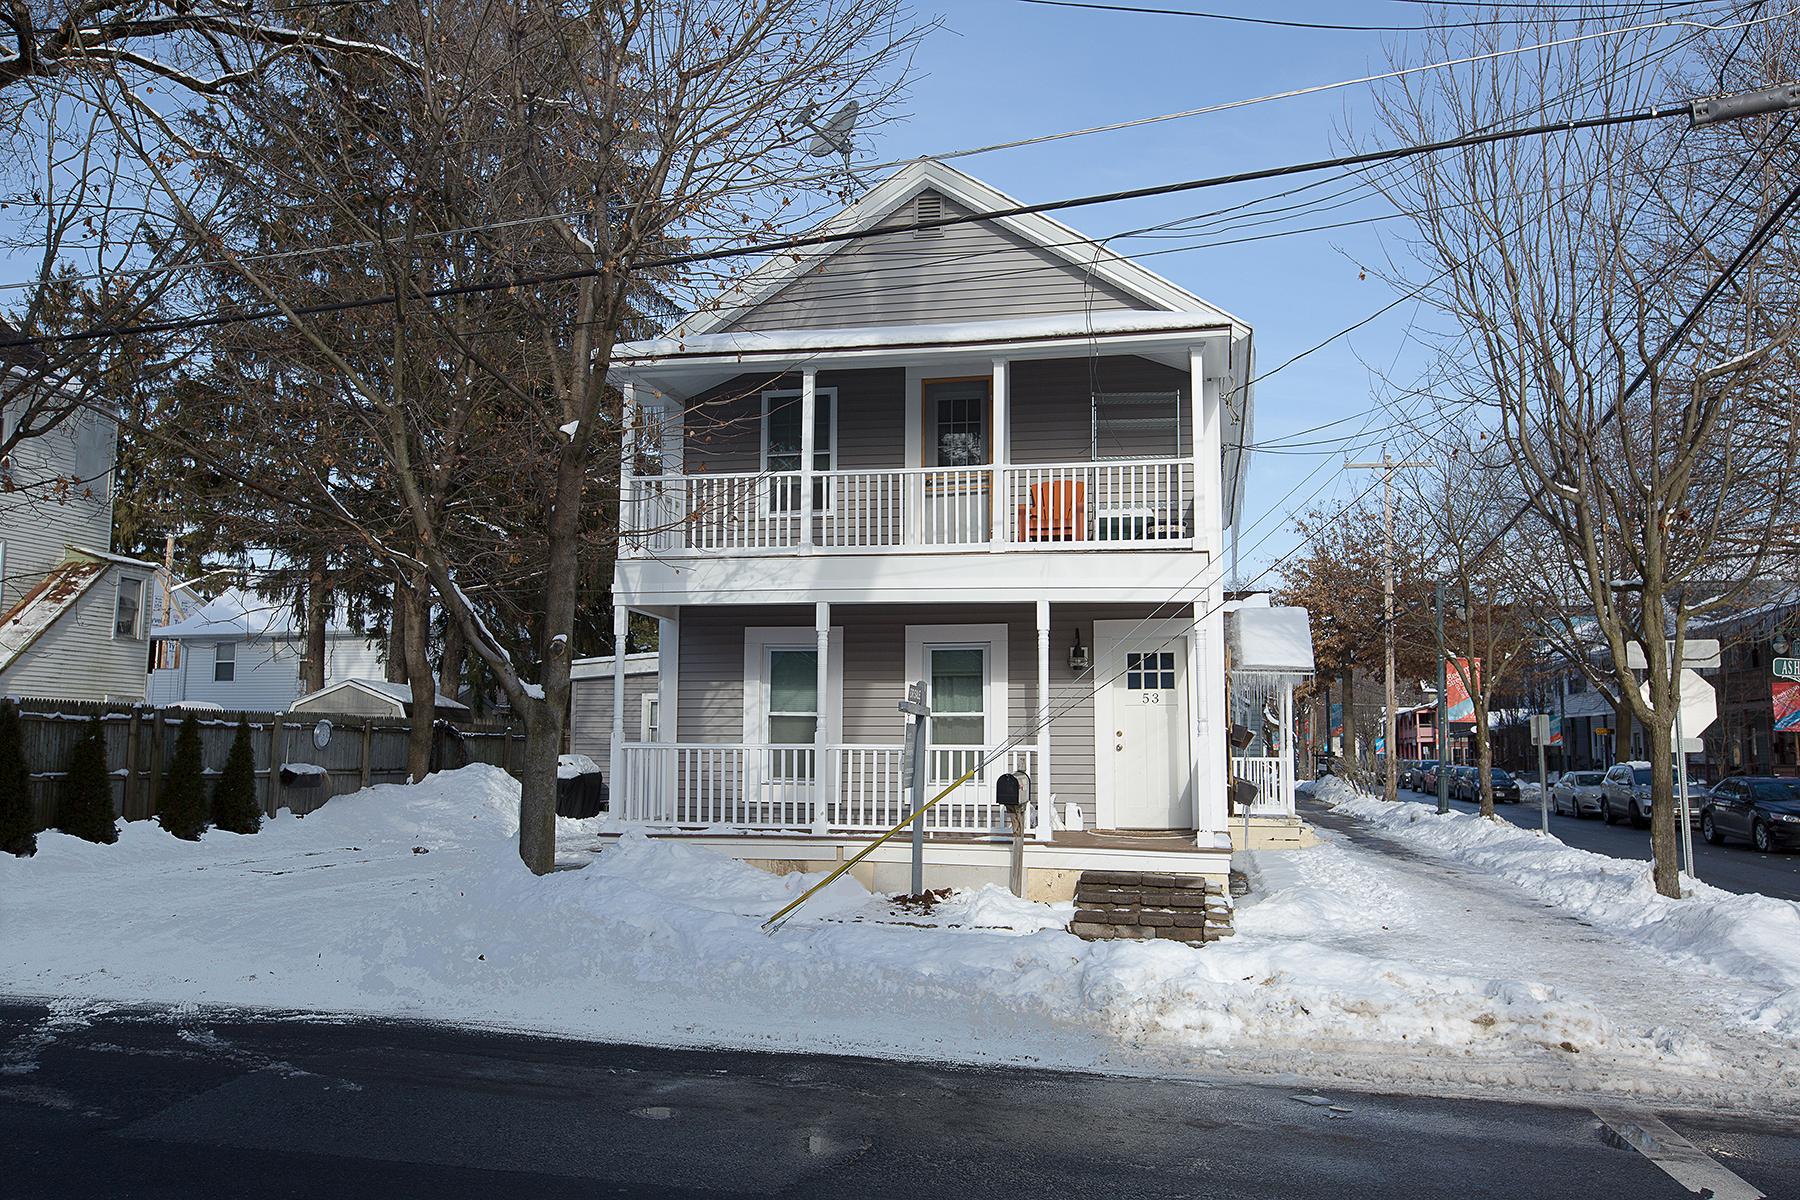 023 EAP Maria Barr 53 Ash Street Saratoga Springs-29.jpg